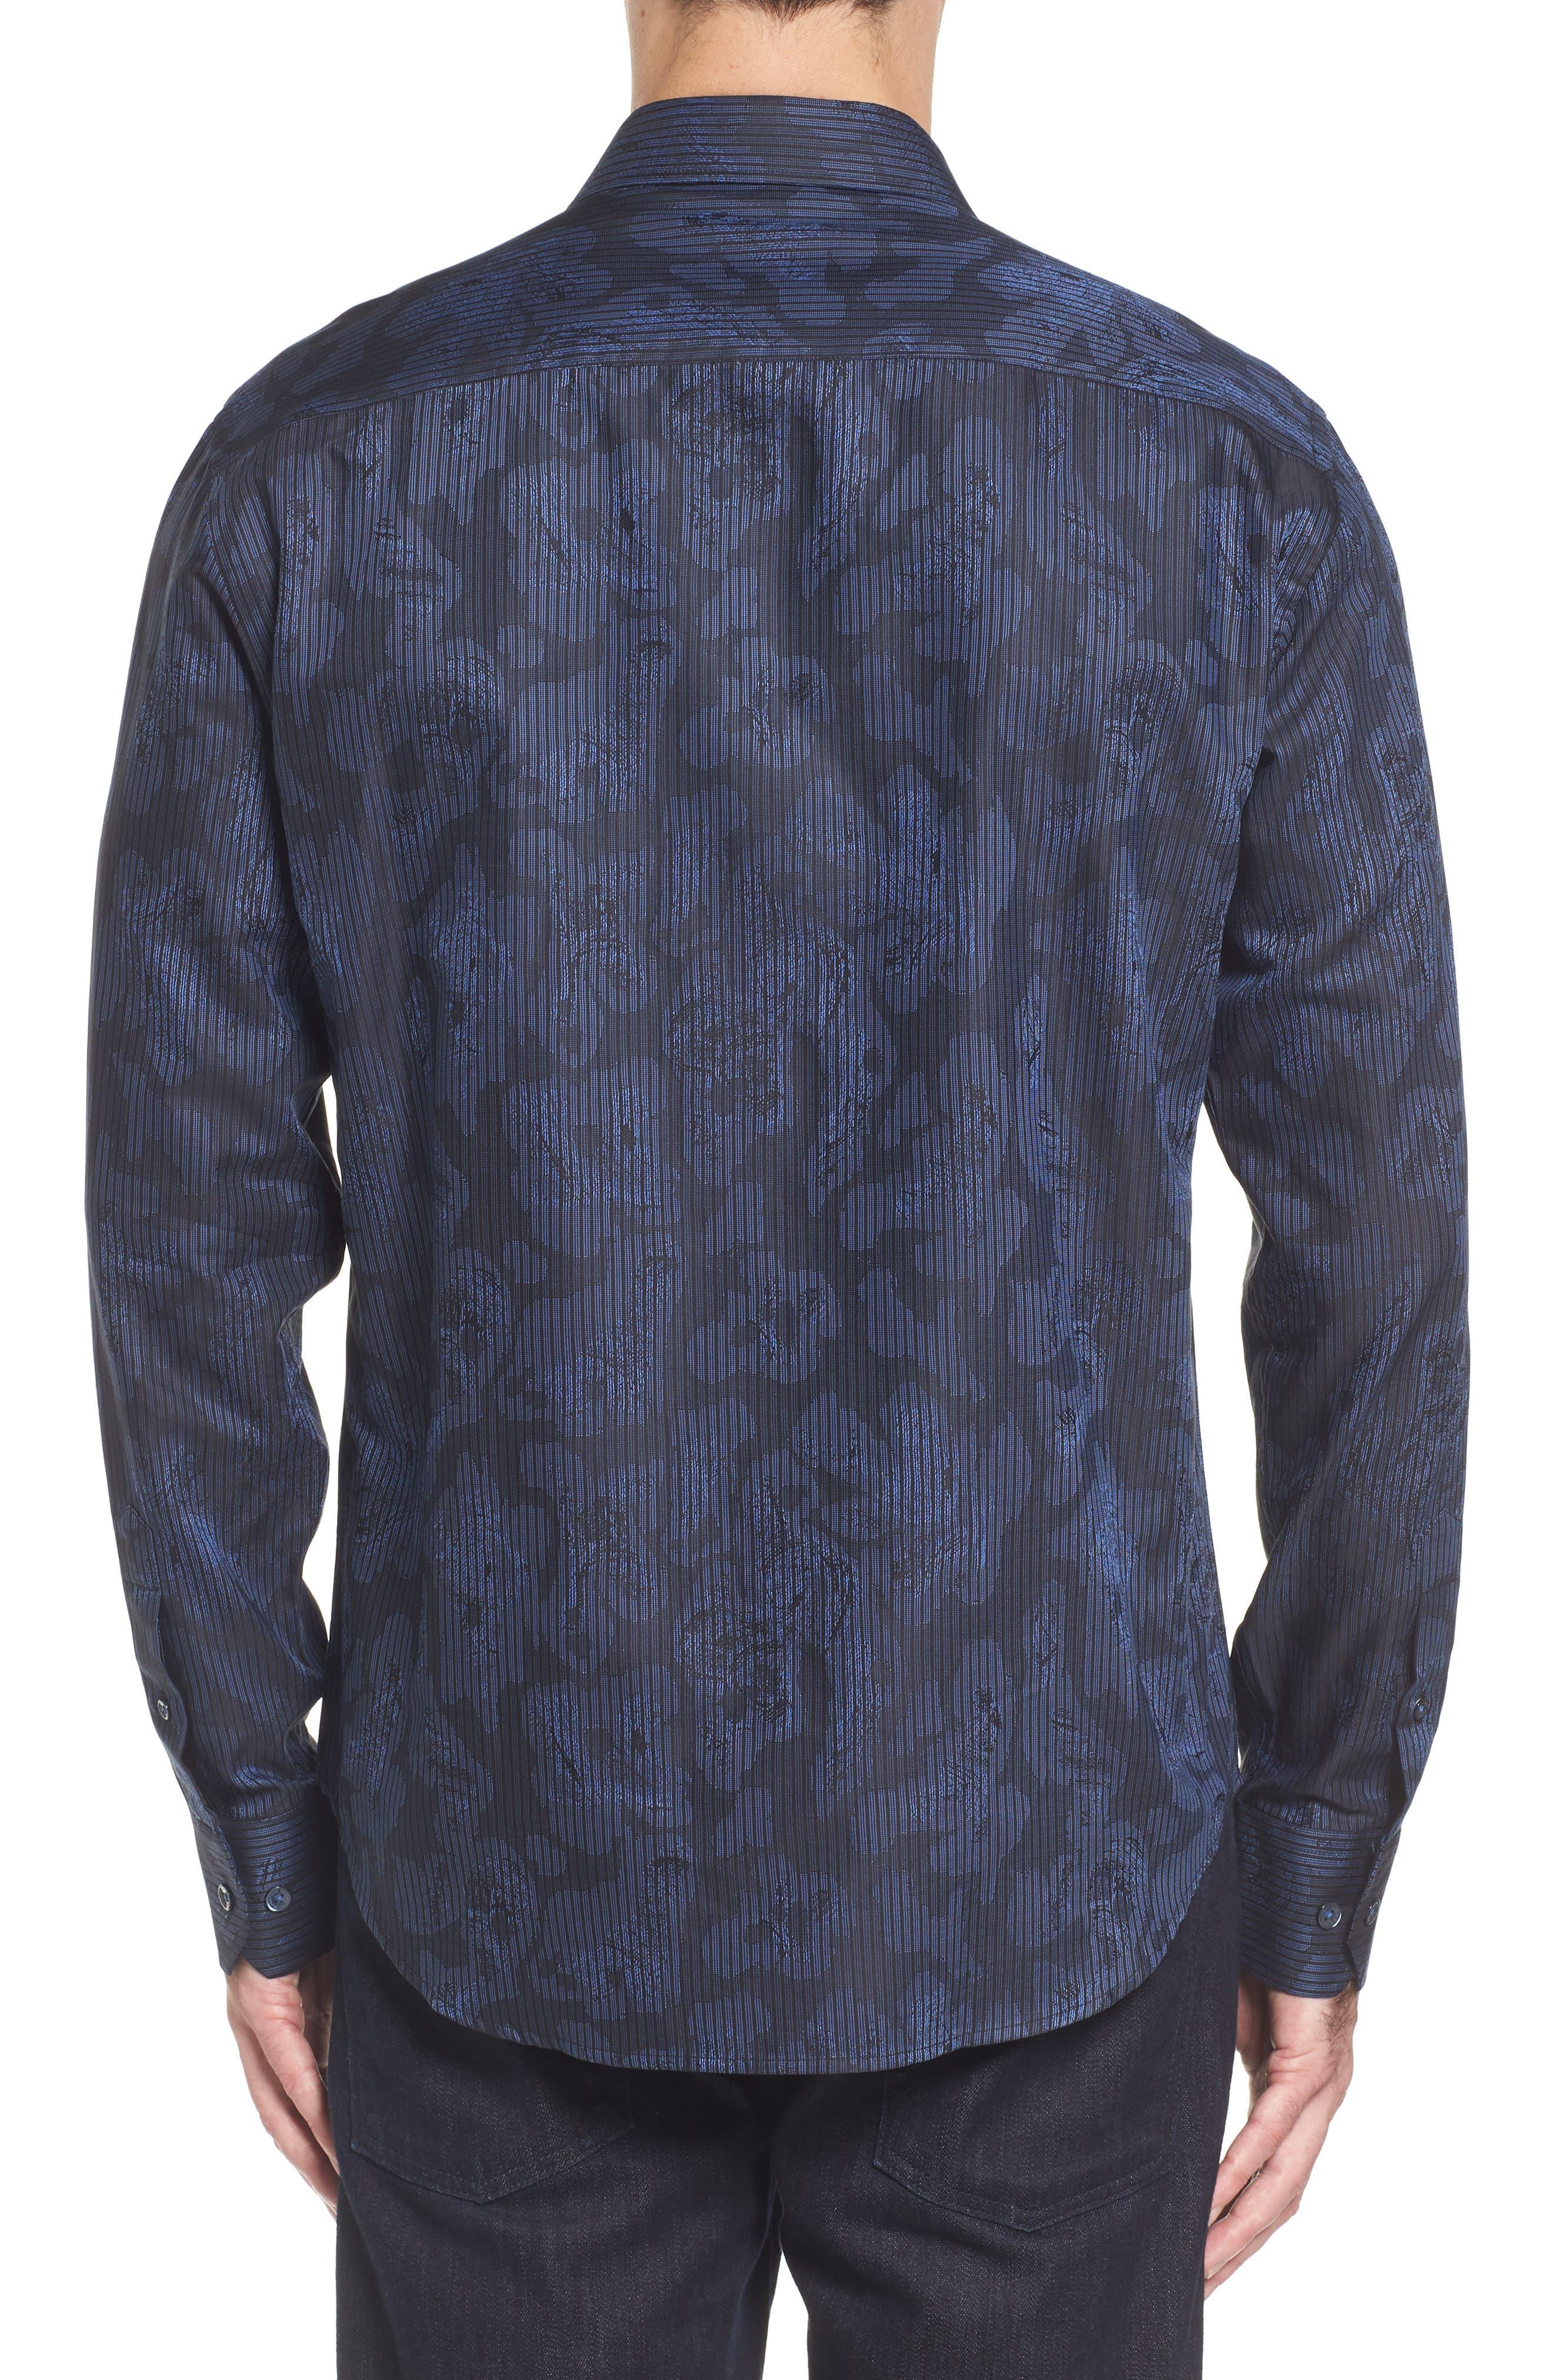 Alternate Image 2  - Bugatchi Slim Fit Jacquard Stripe Sport Shirt